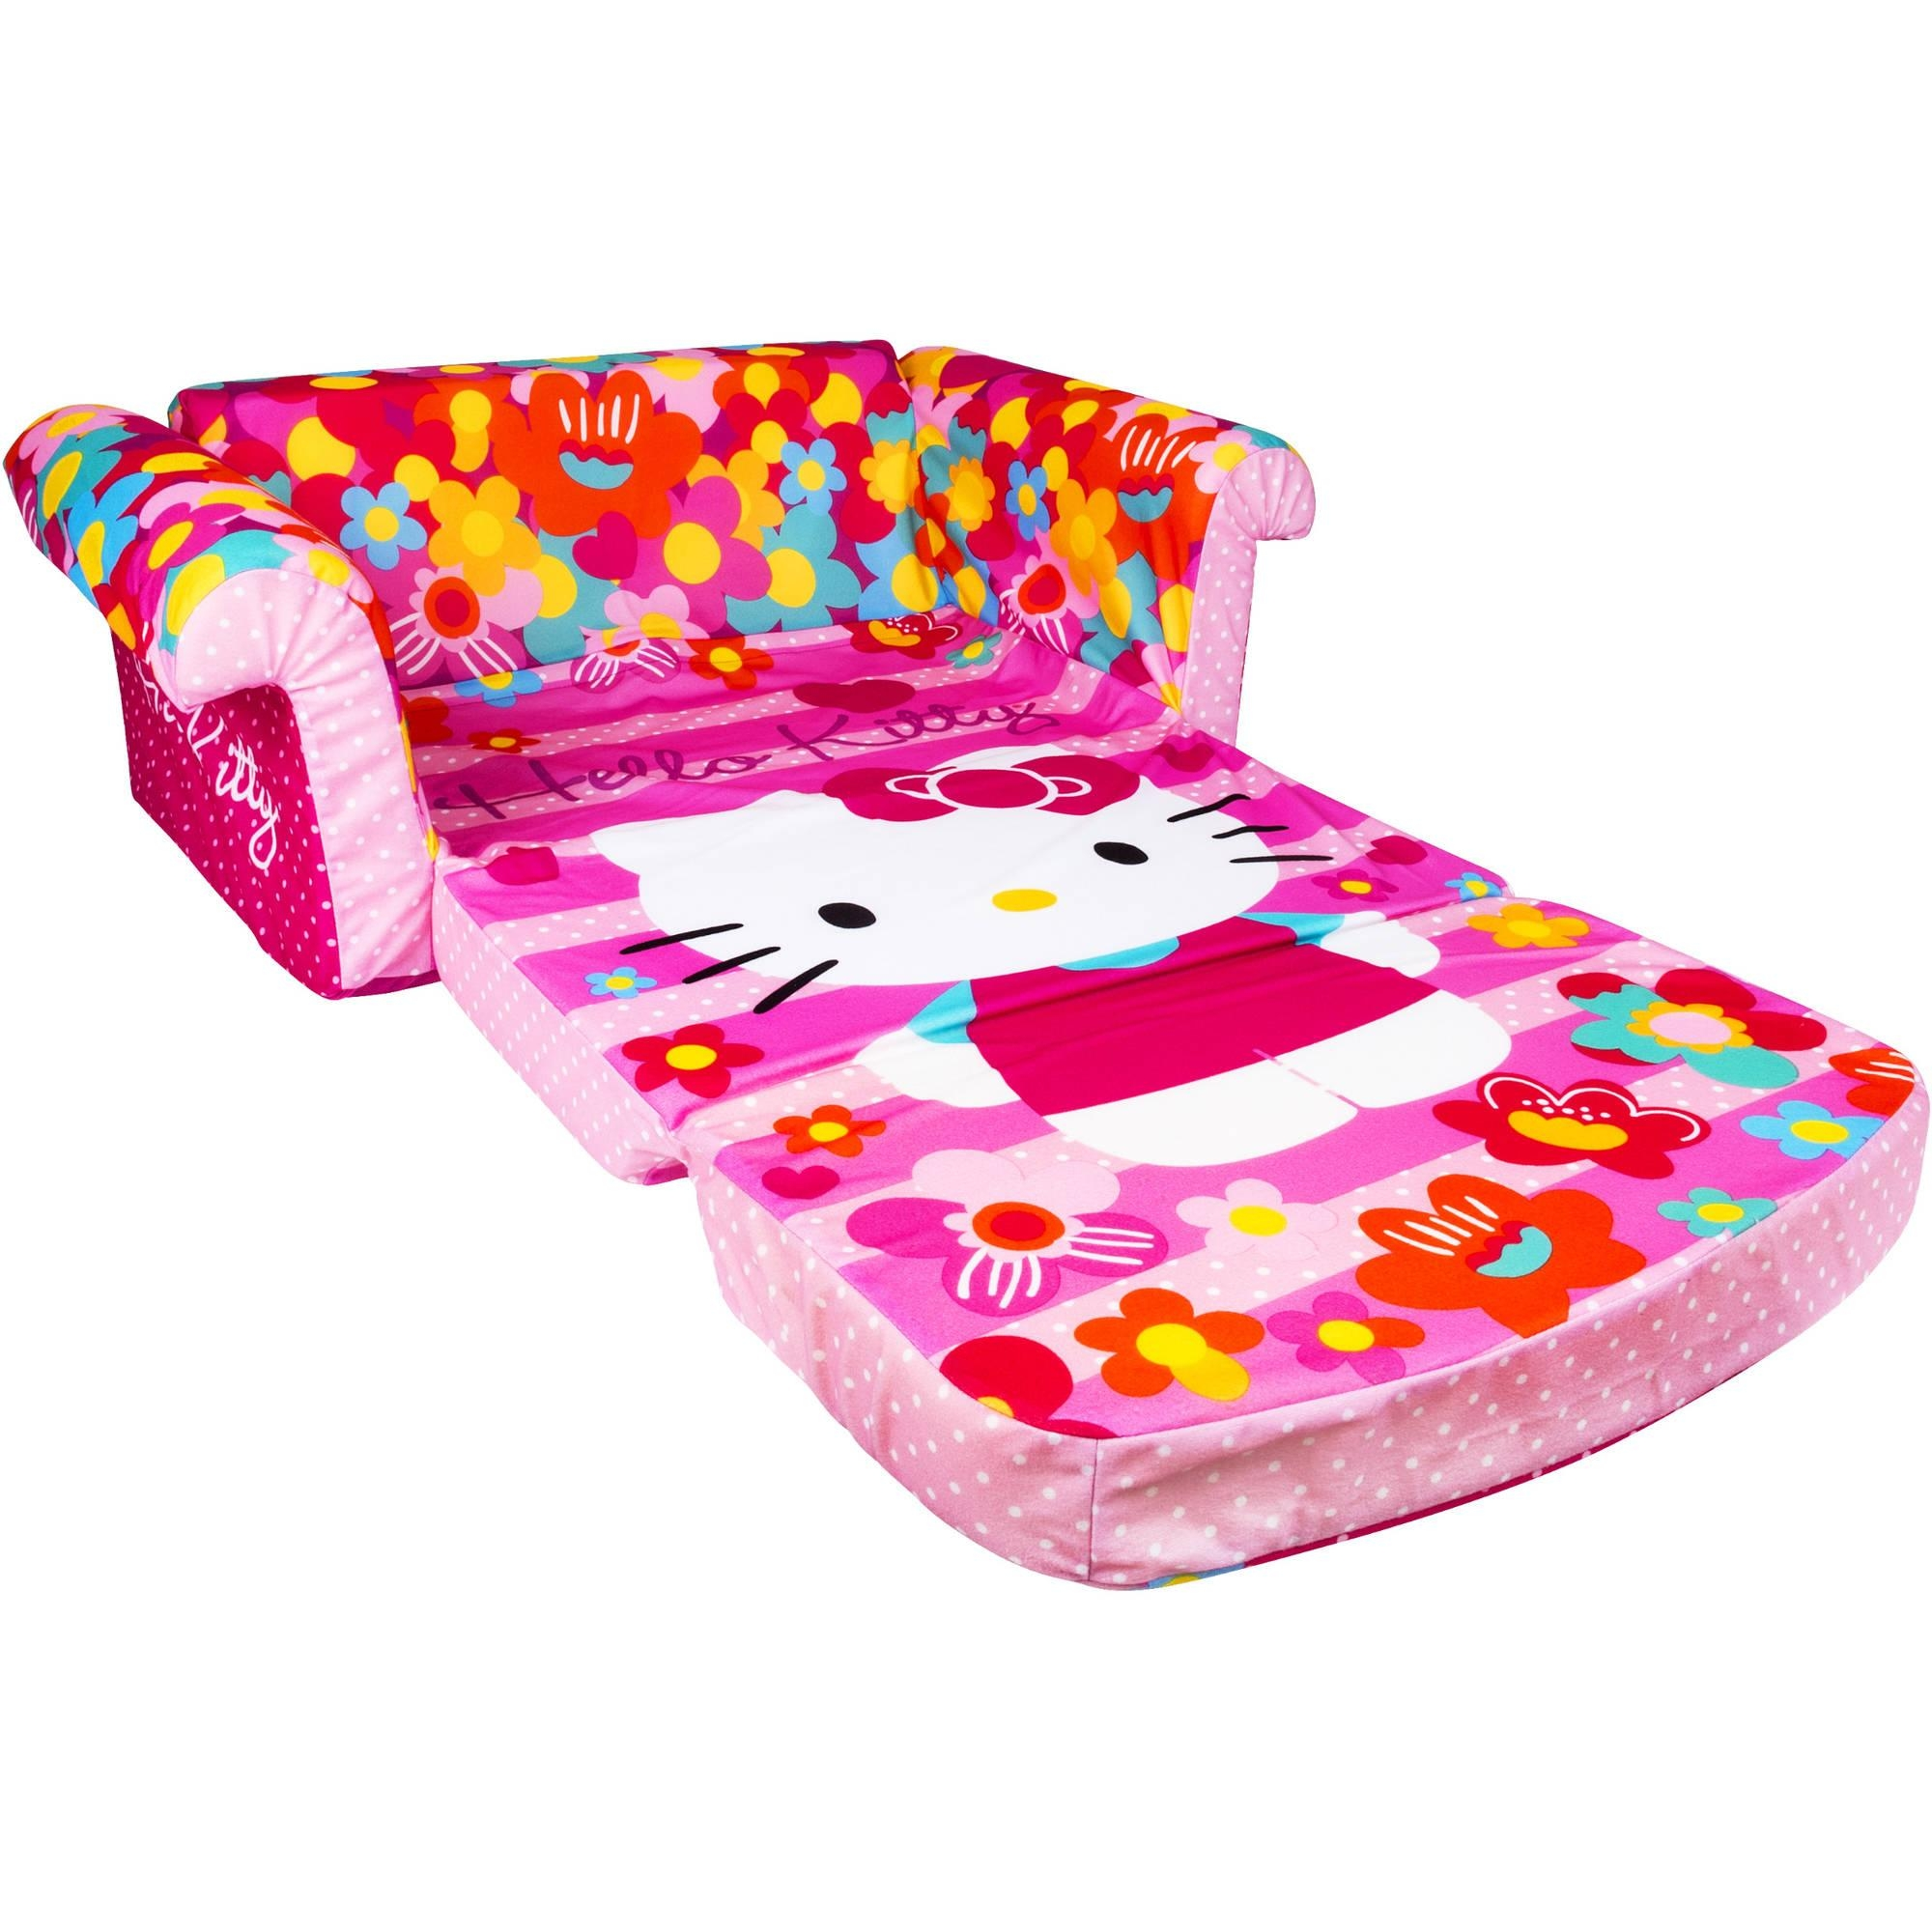 Marshmallow Furniture Flip Open Sofa, Hello Kitty – Walmart For Flip Open Kids Sofas (View 4 of 20)